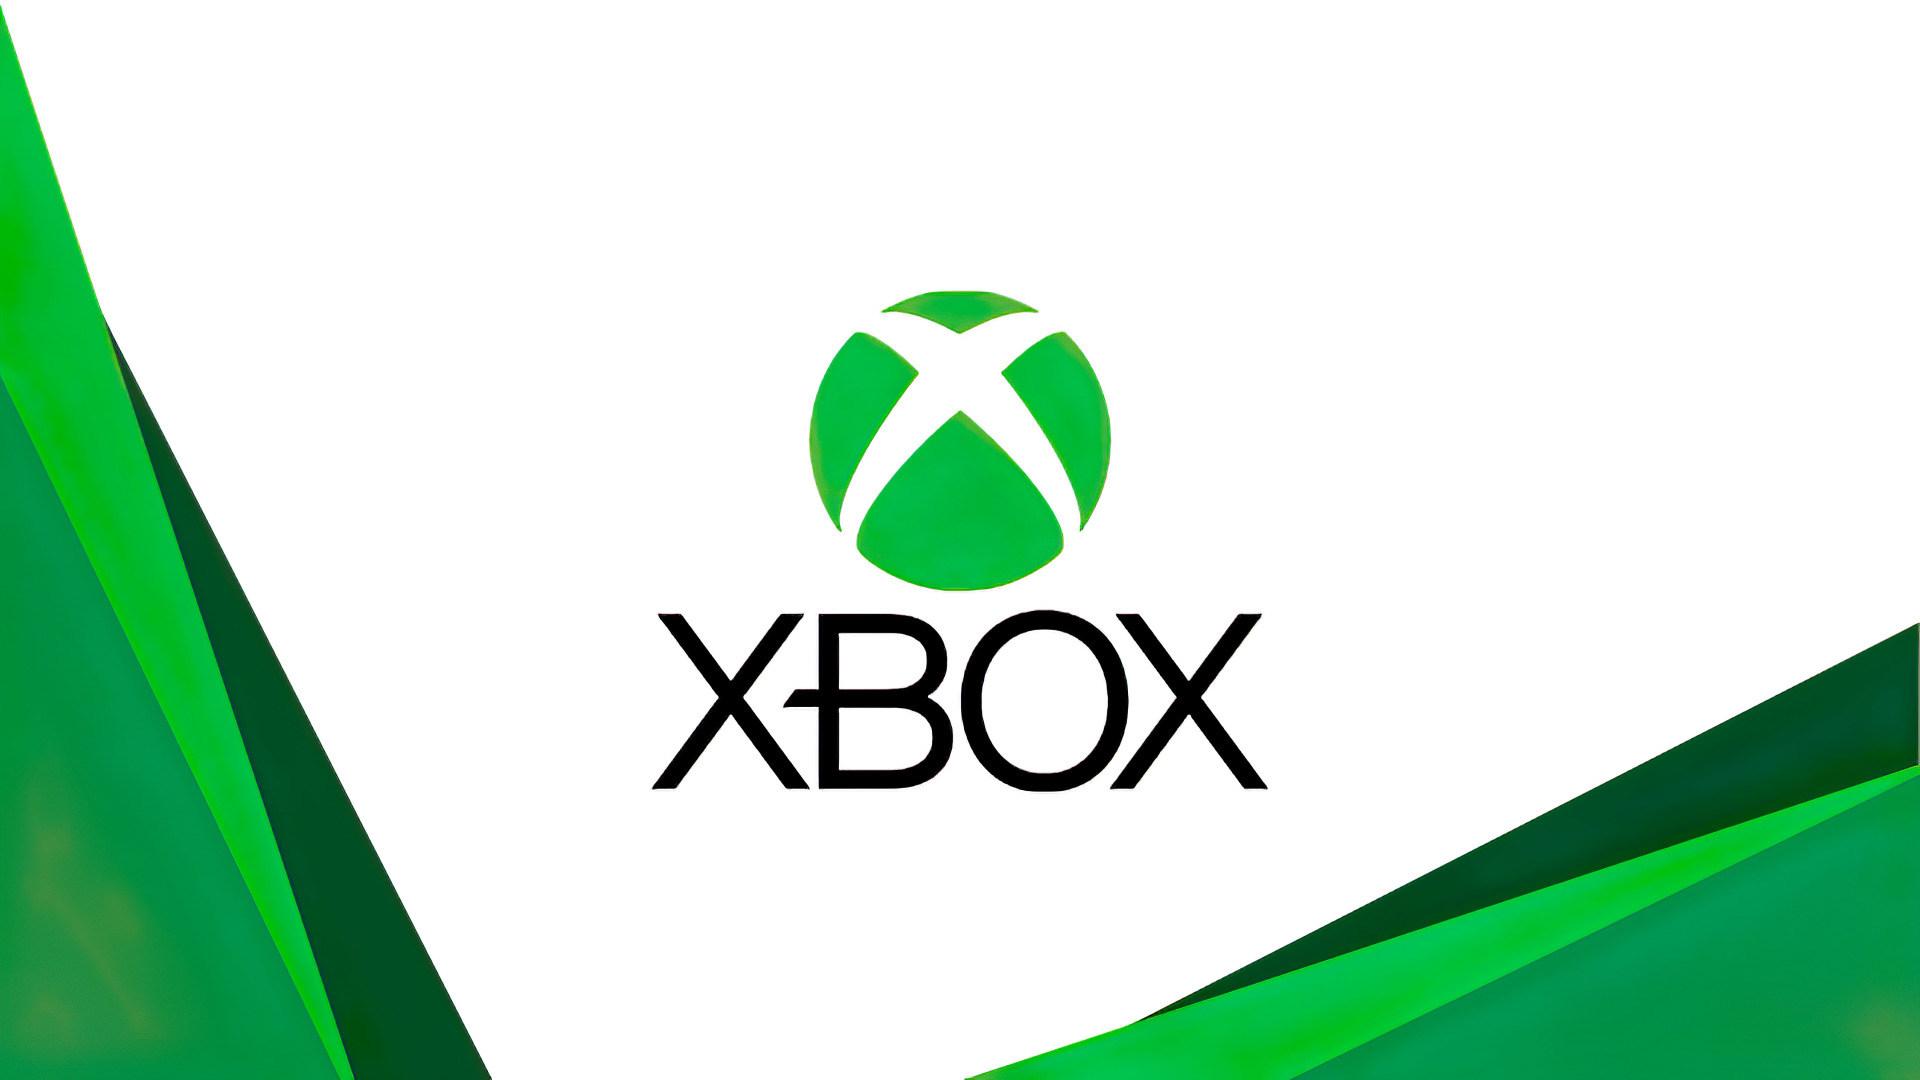 Microsoft, Gaming, Konsole, Spielkonsole, Xbox, Xbox One, Logo, Xbox 360, Microsoft Xbox One, Spielekonsole, Spielekonsolen, Xbox Live, Xbox Series X, Xbox One S, Microsoft Xbox, Xbox Logo